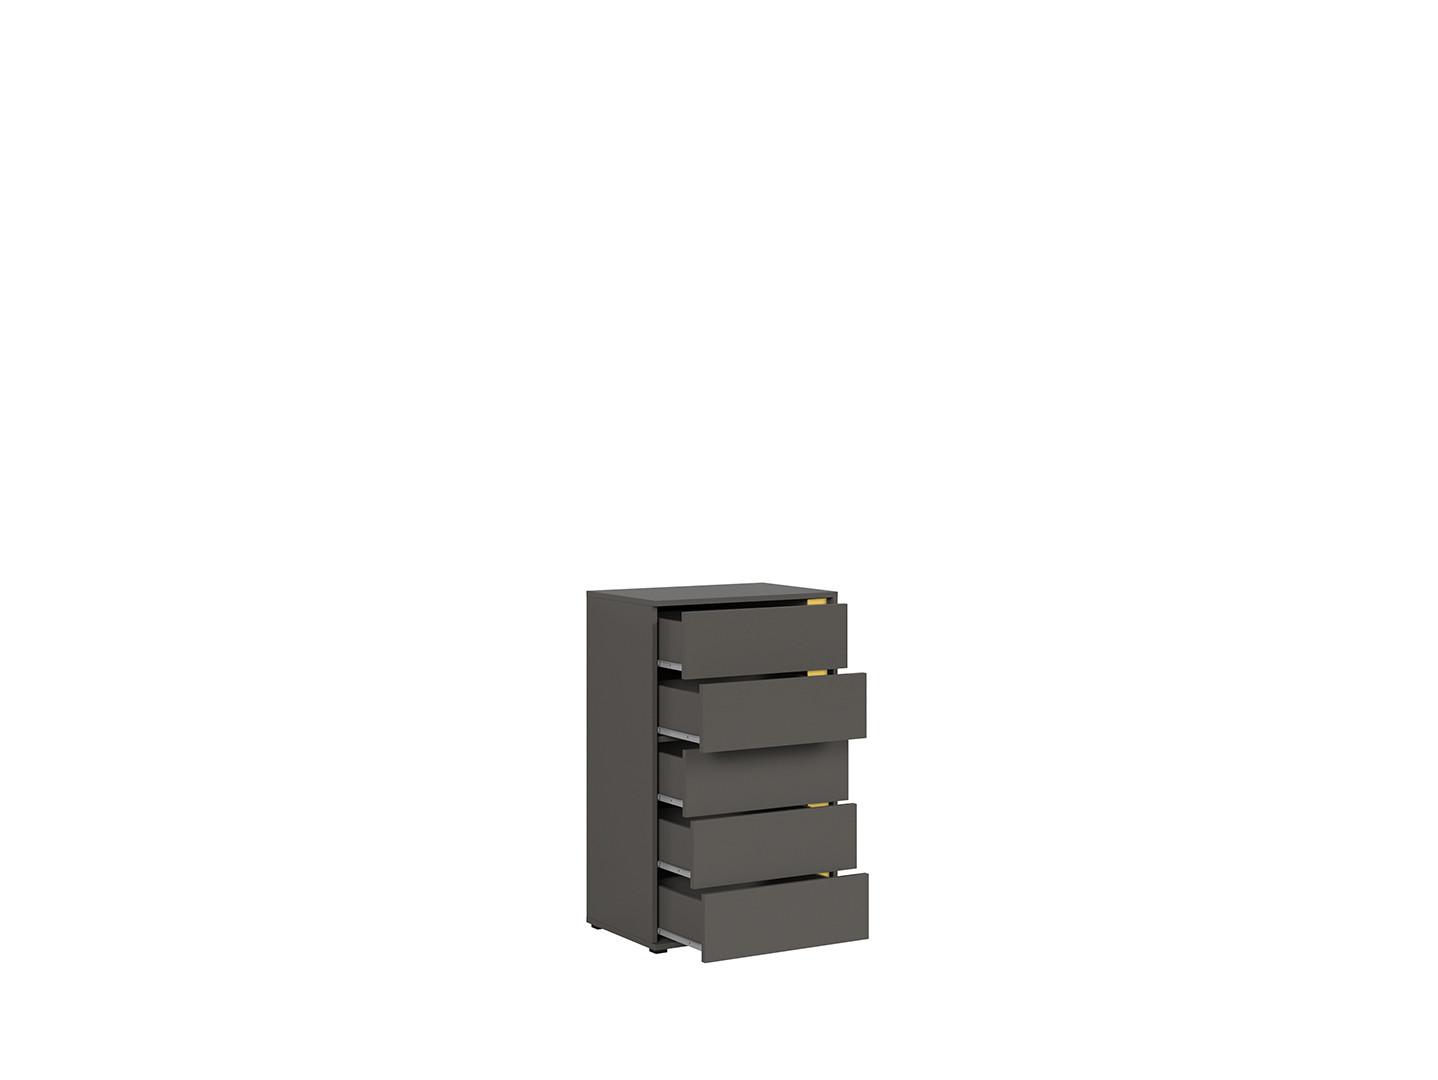 Komoda GRAPHIC KOM5SL/C sivý wolfram